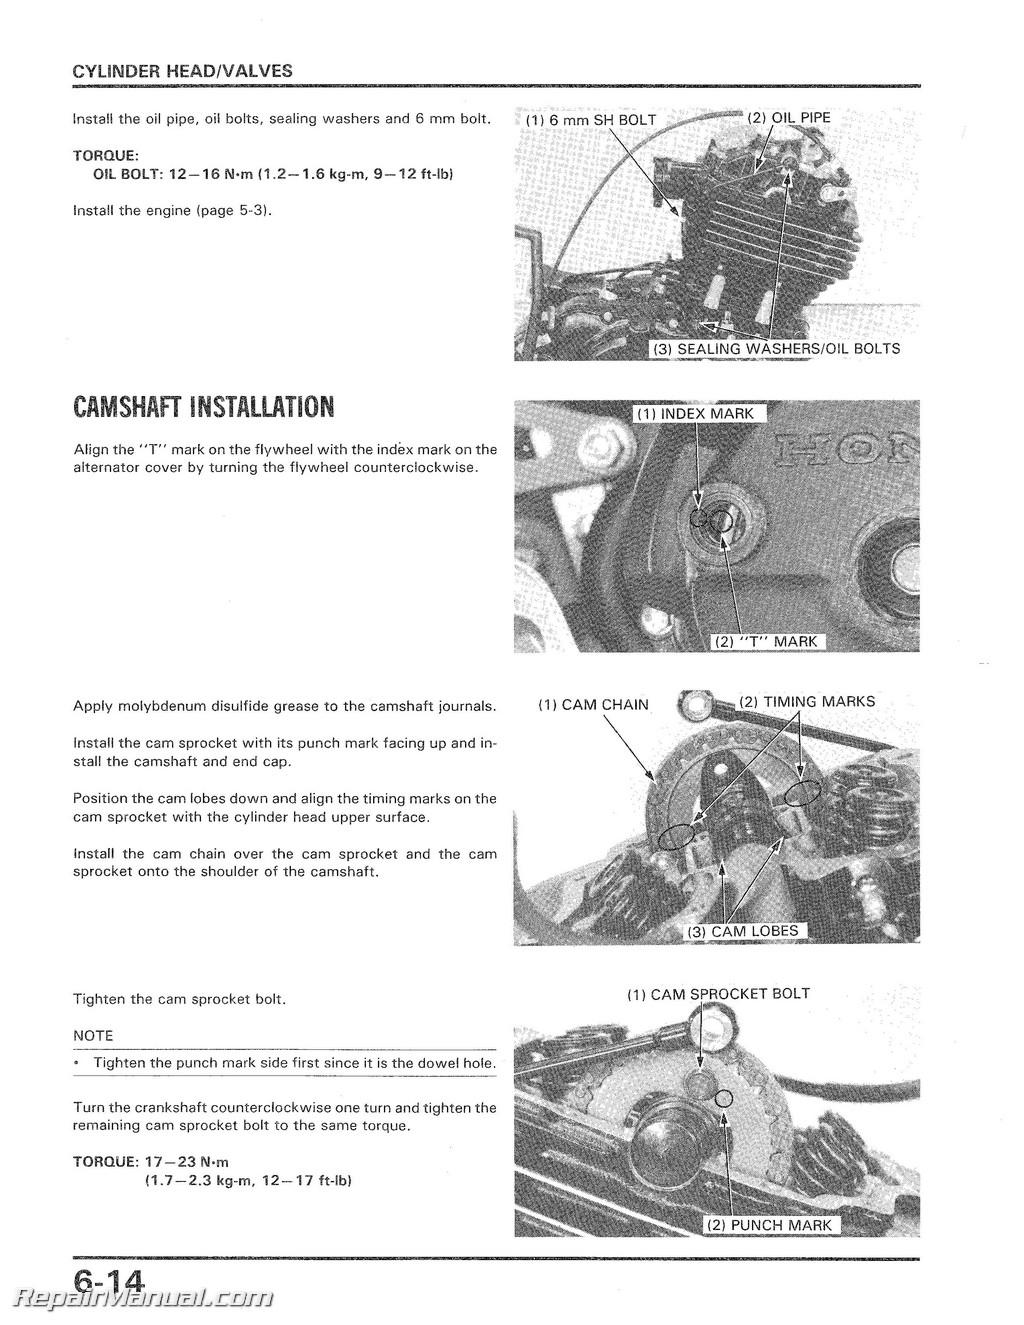 Honda ATCX Service Manual - 1977 honda odyssey fl250 wiring diagram